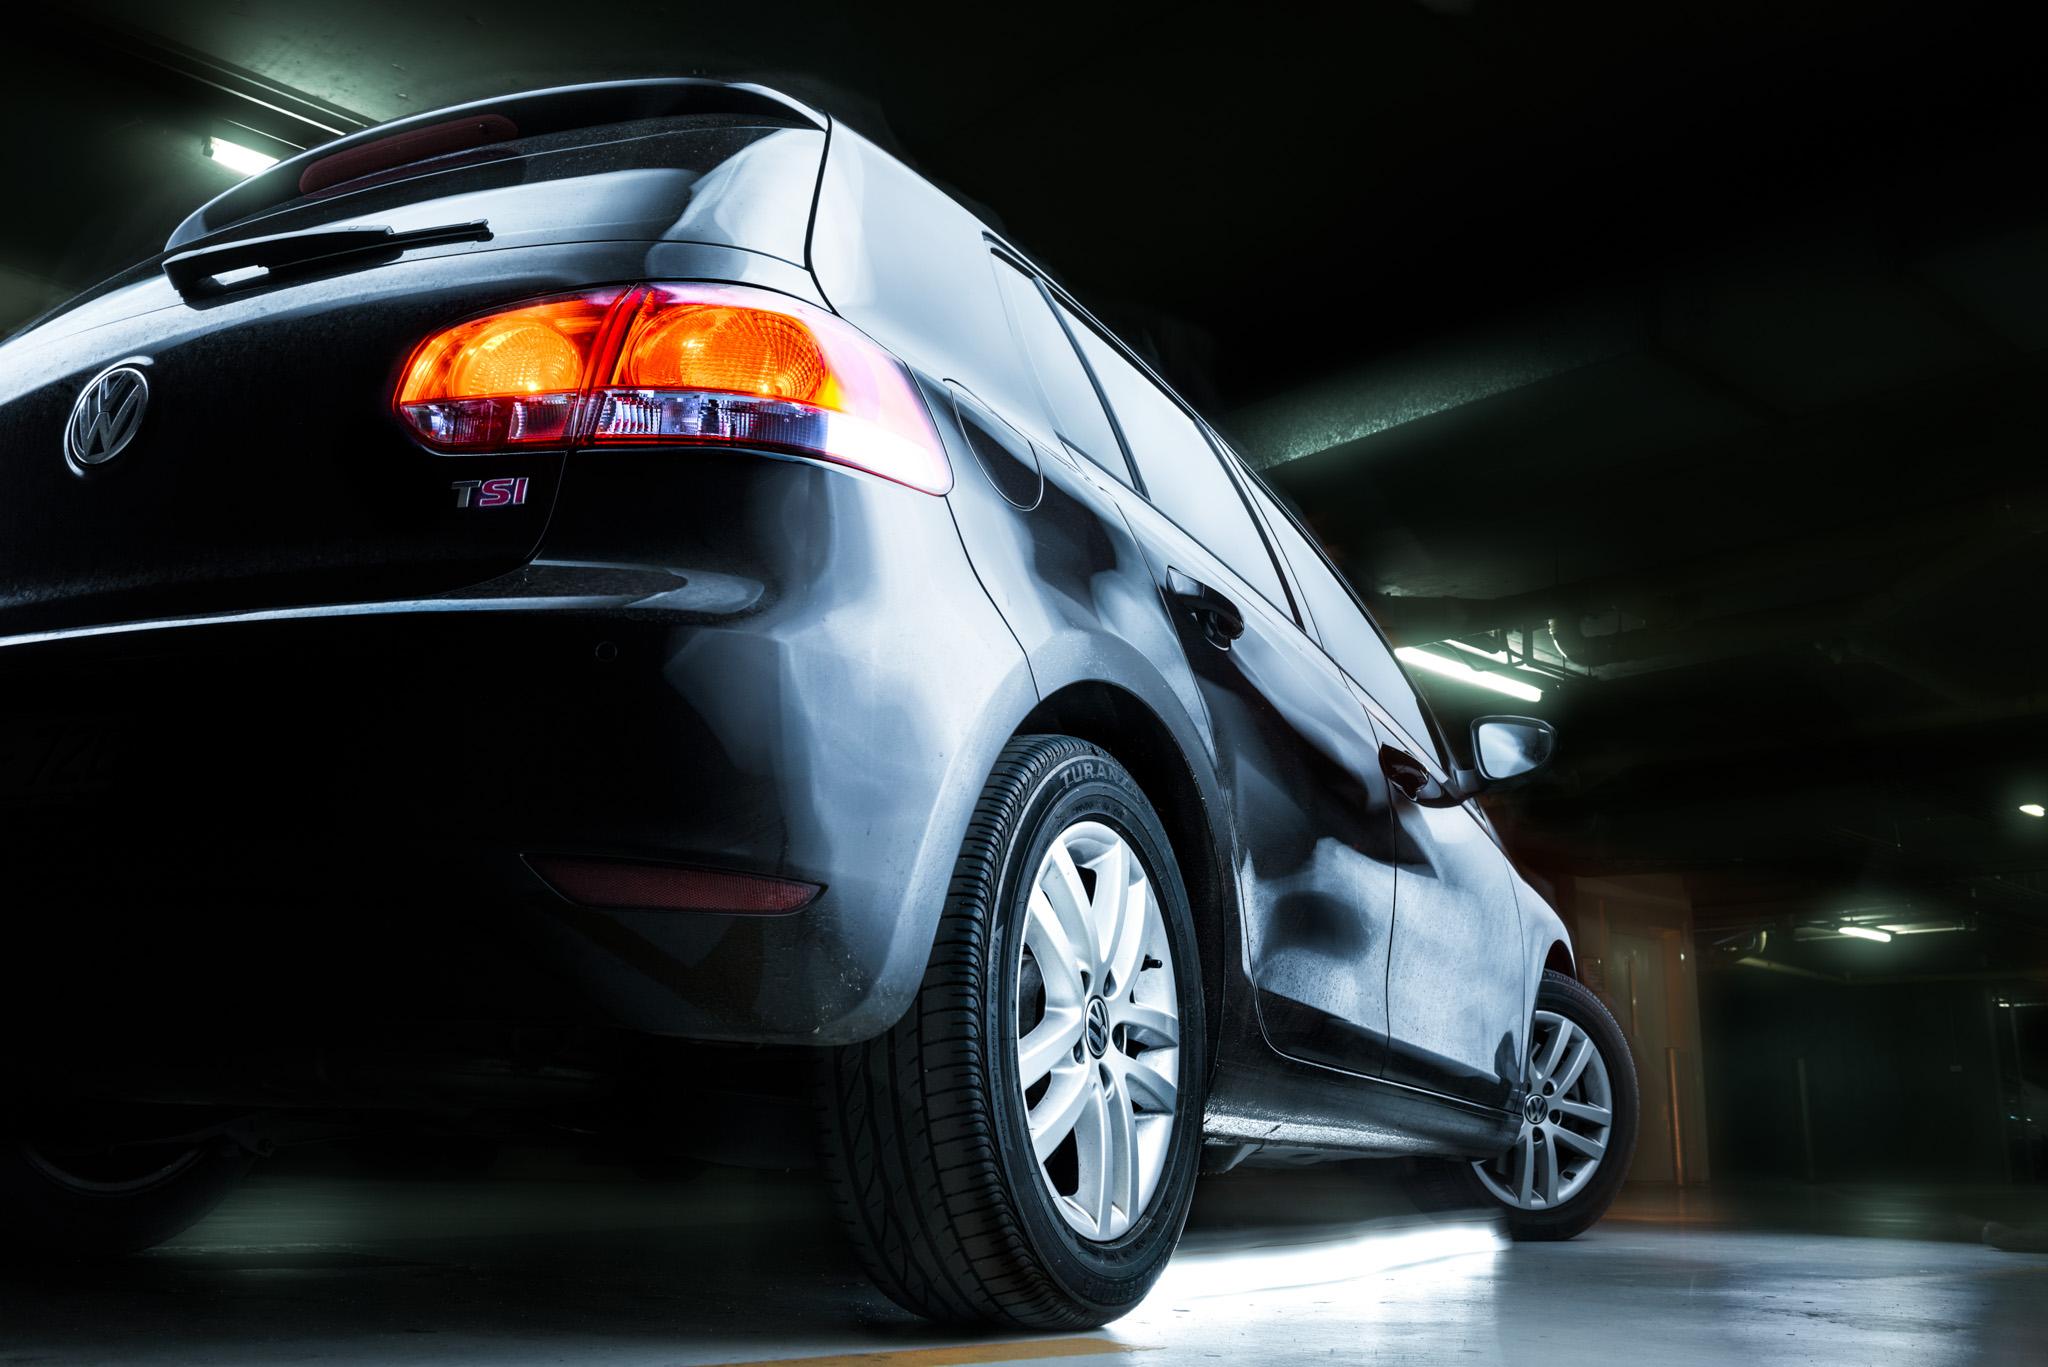 Light Painting - Volkswagen Golf Mk6 black